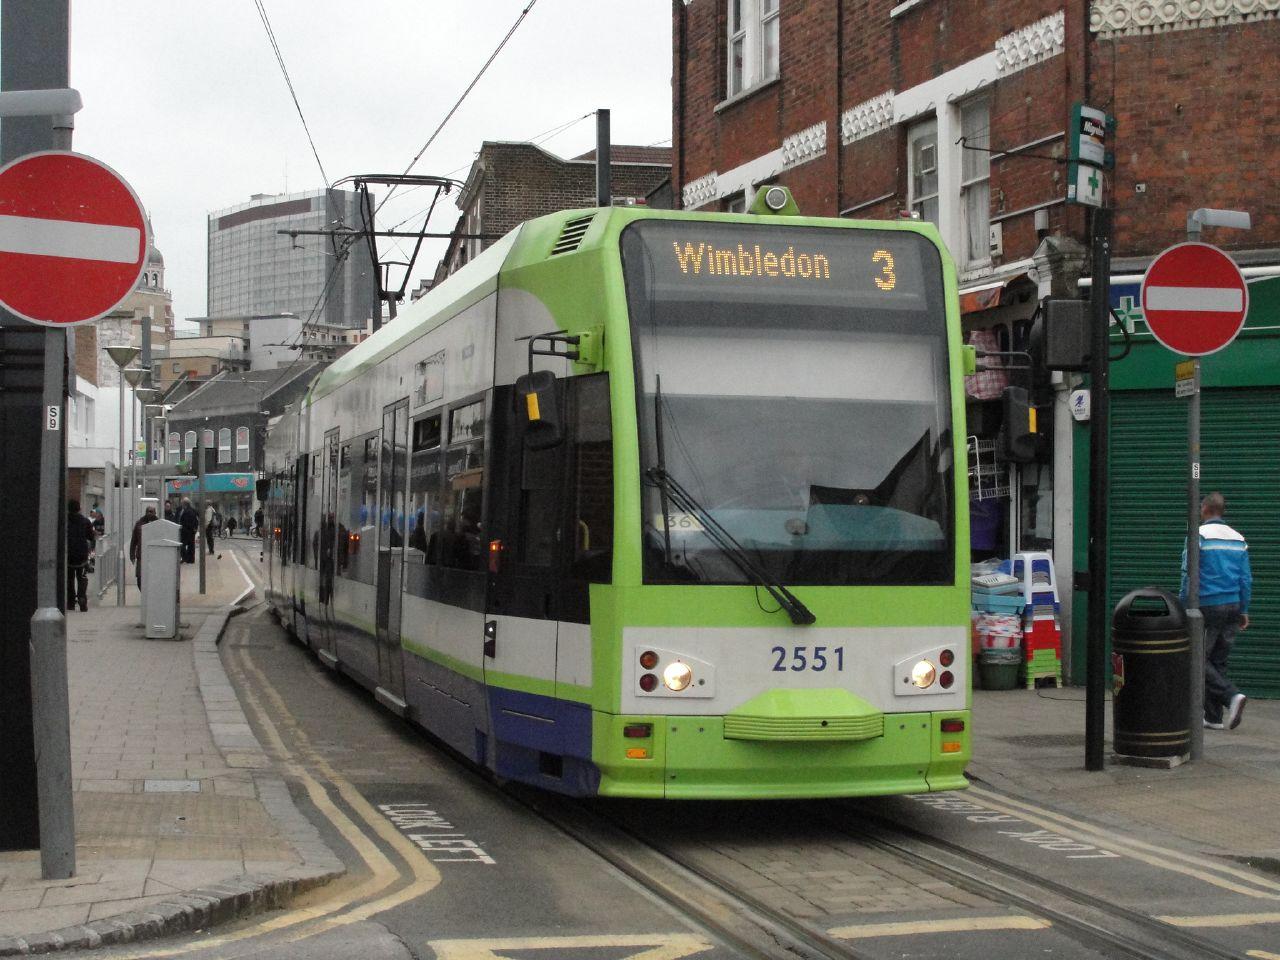 File:Tramlink tram 2551.jpg